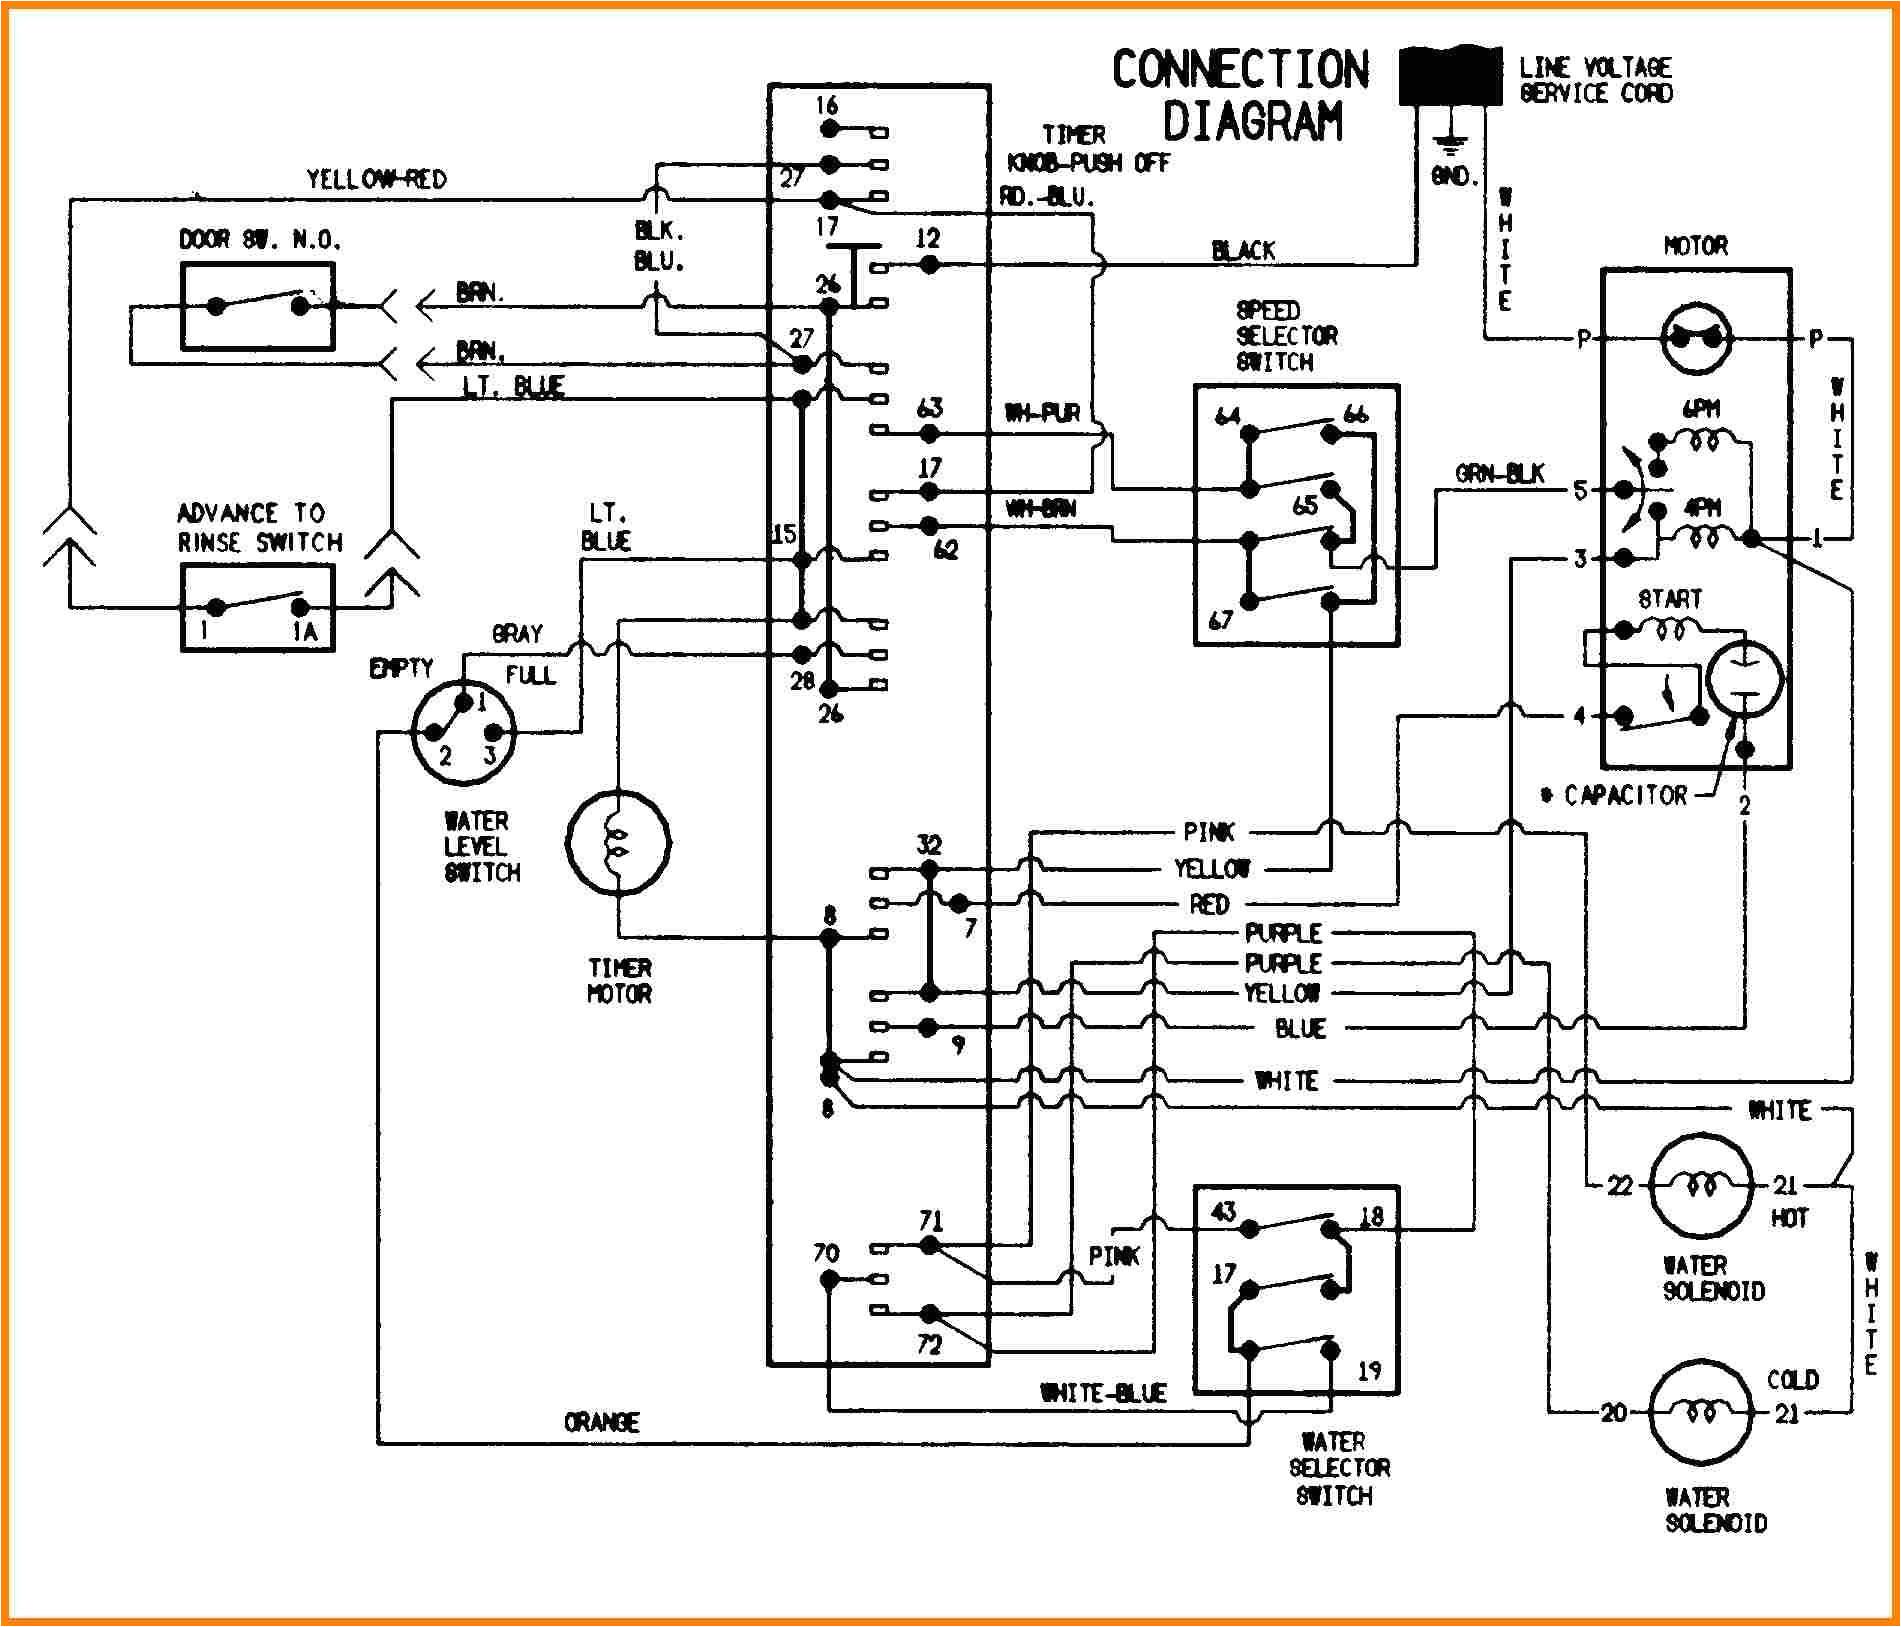 Whirlpool Semi Automatic Washing Machine Wiring Diagram Whirlpool Semi Automatic Washing Machine Wiring Diagram Elegant Lg